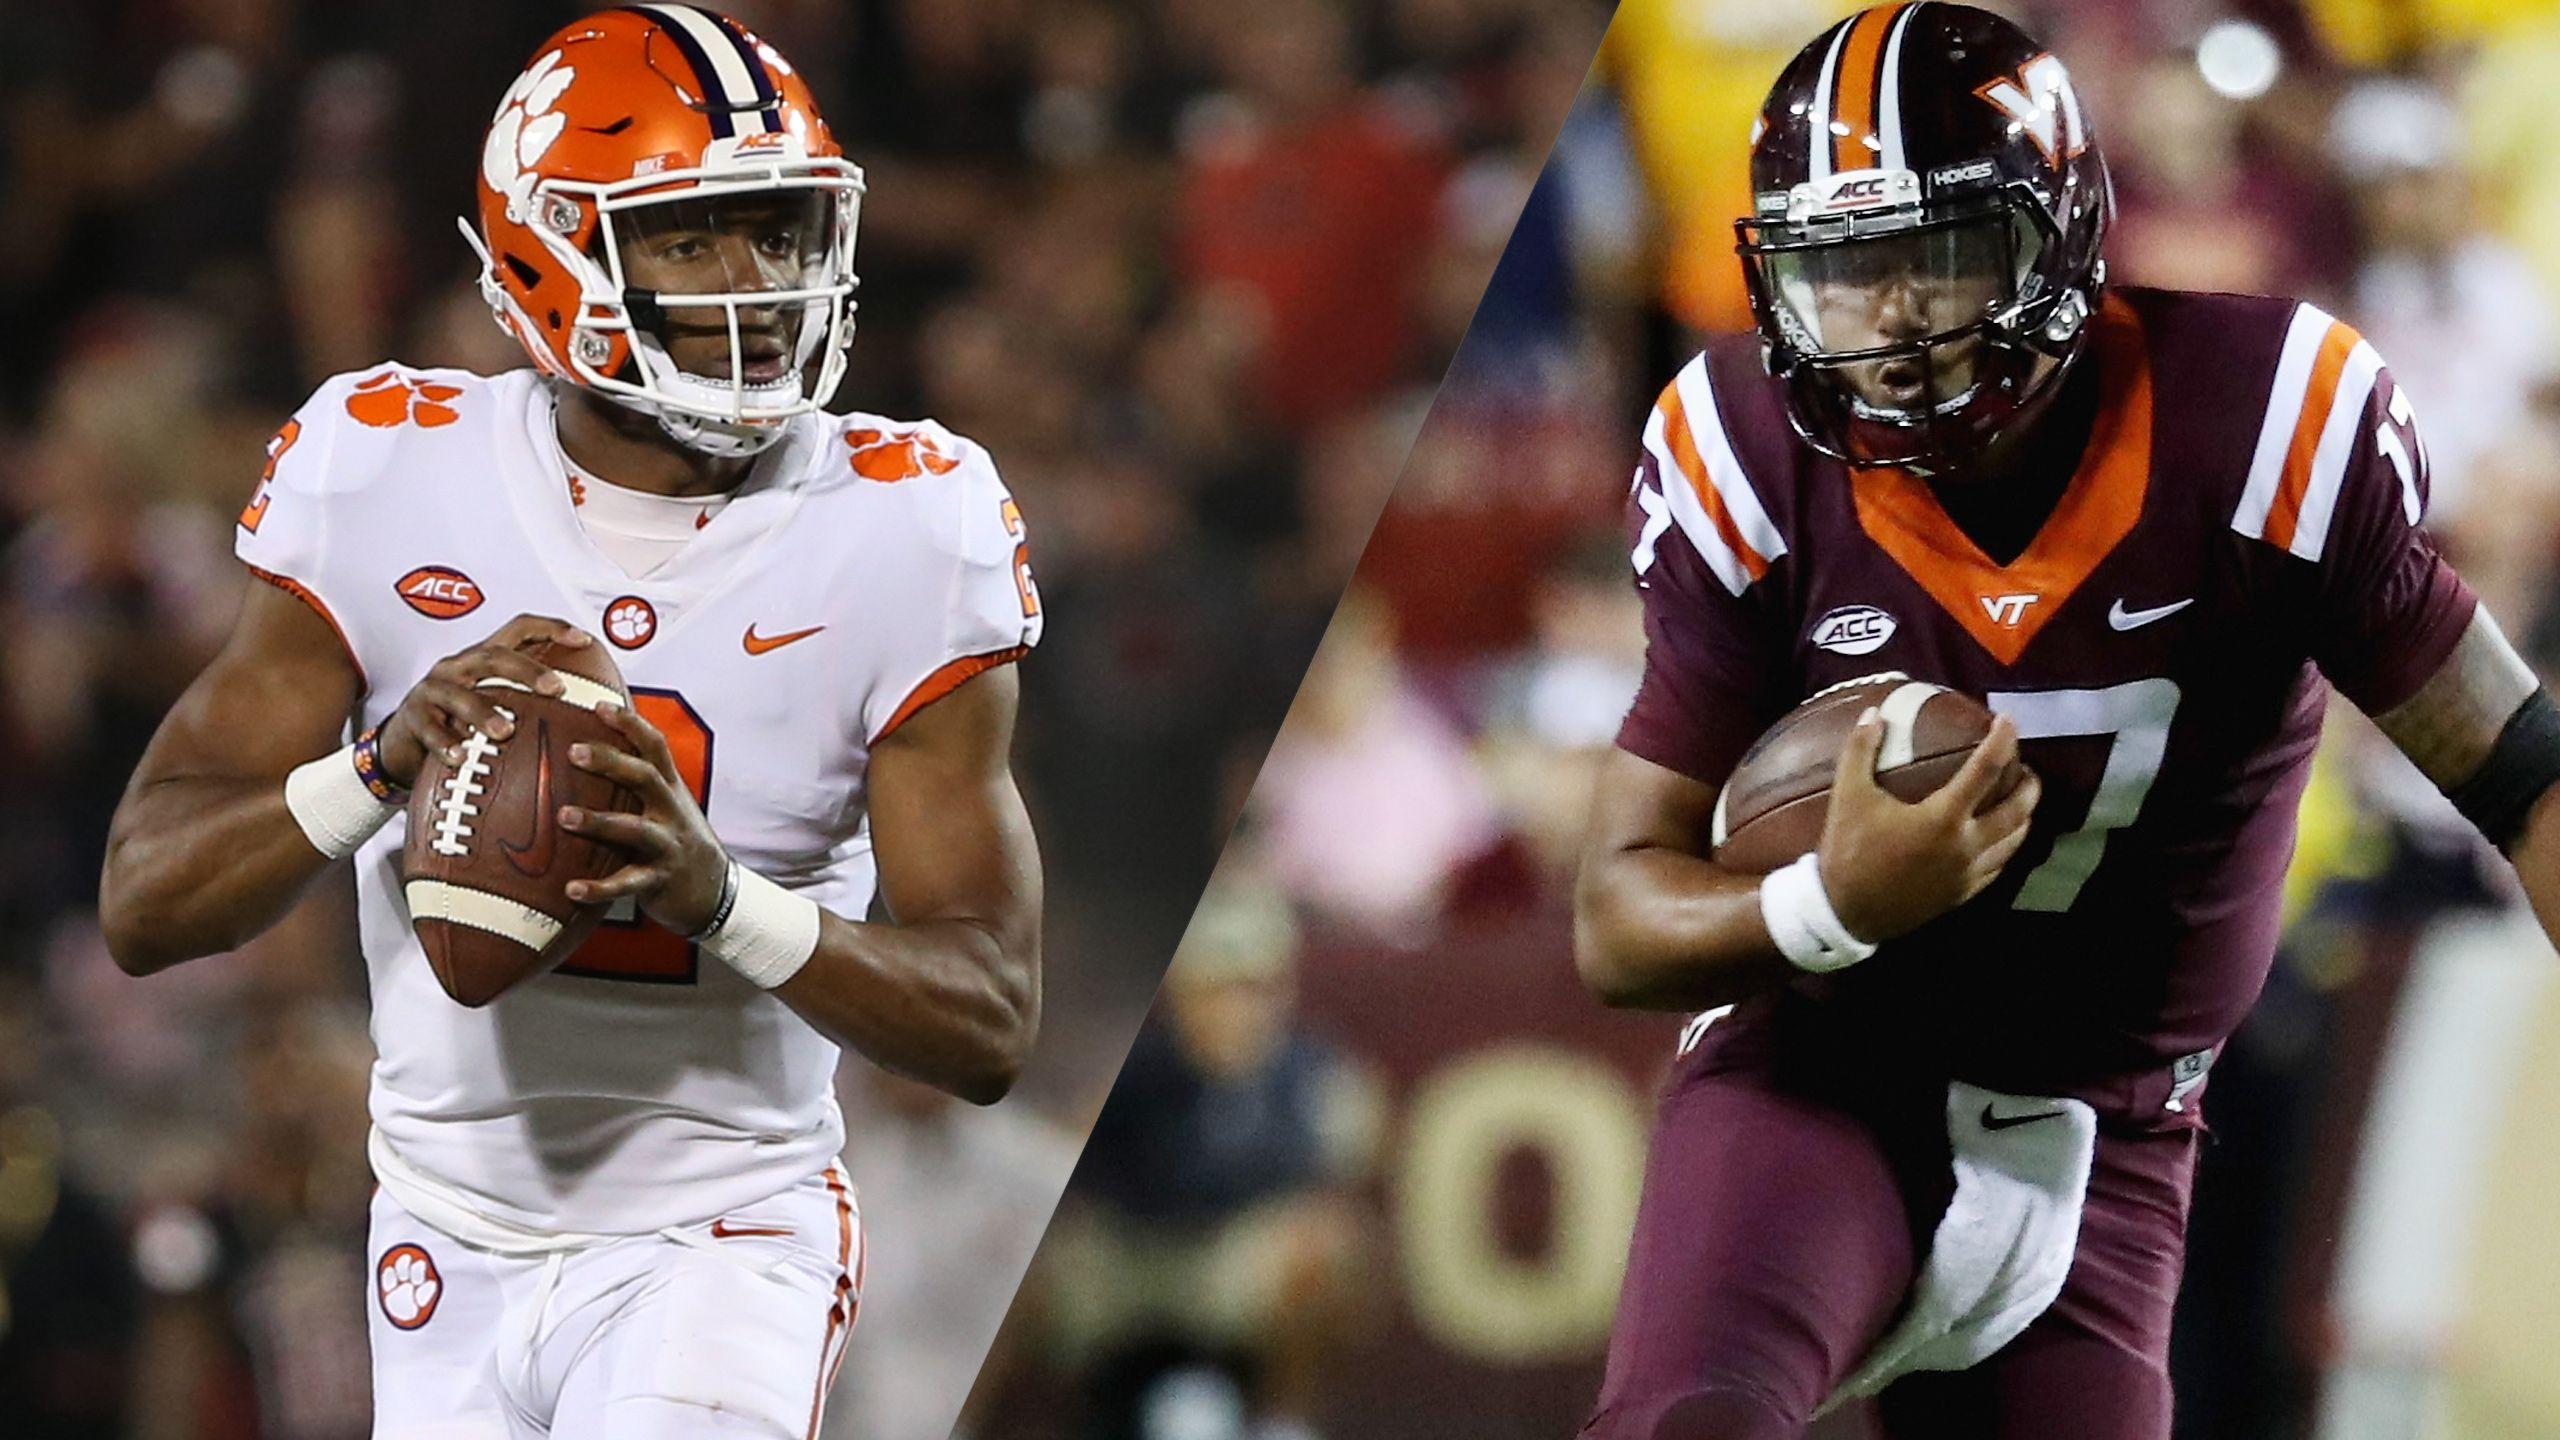 #2 Clemson vs. #12 Virginia Tech (Football)